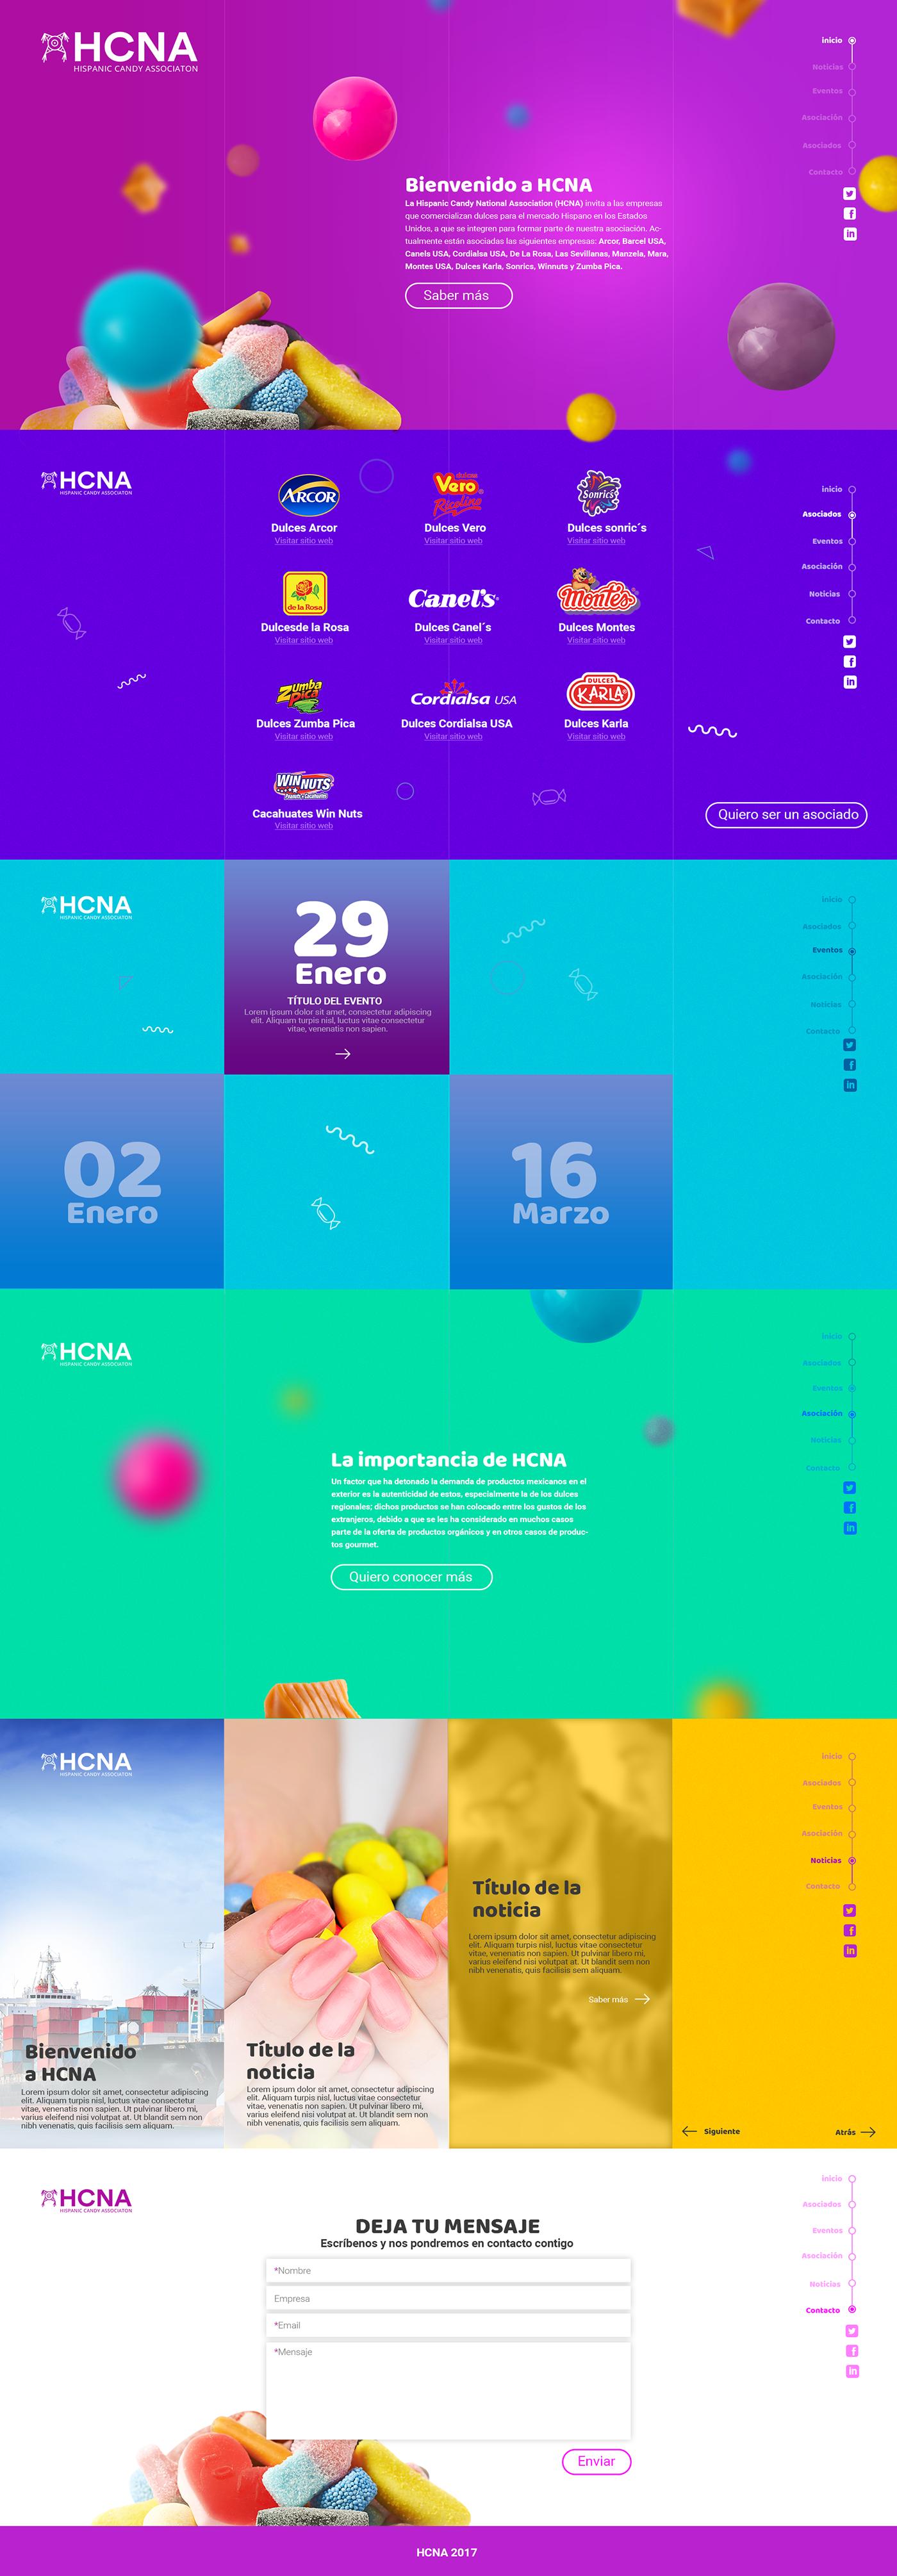 Web Design  ui design UX design Creativity photoshop